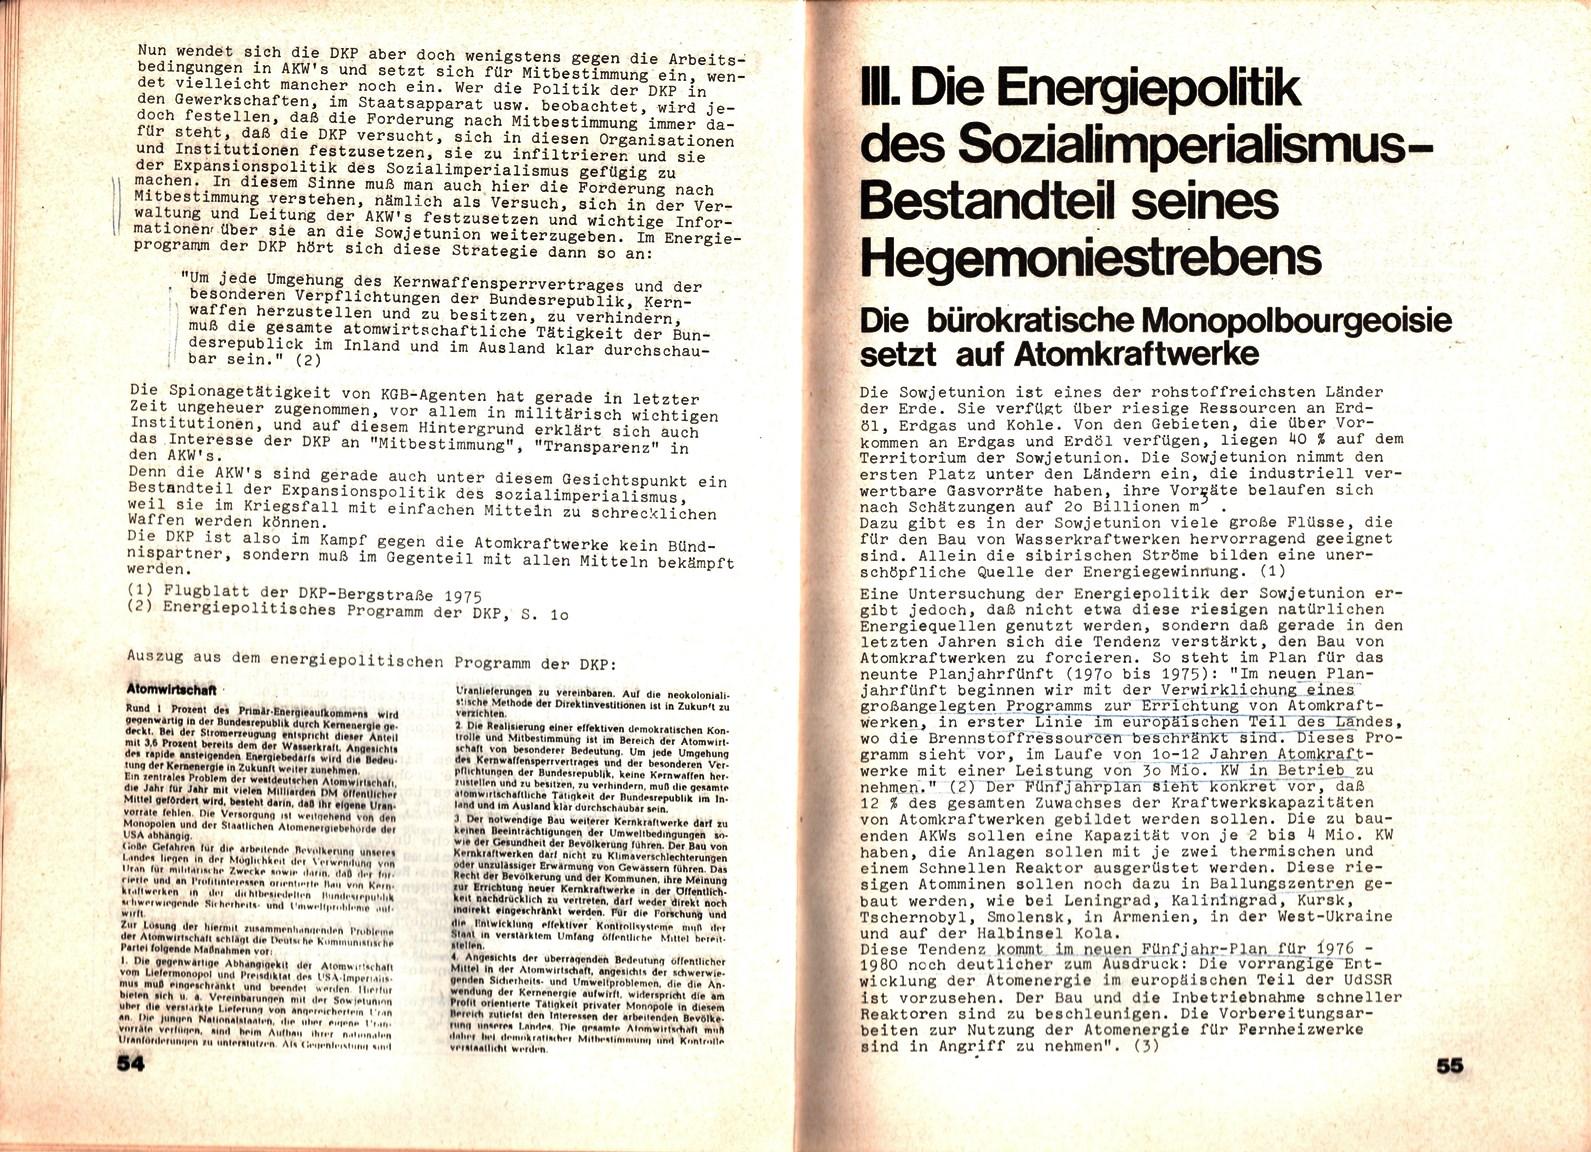 KSV_1976_Atomenergie_im_Kapitalismus_029